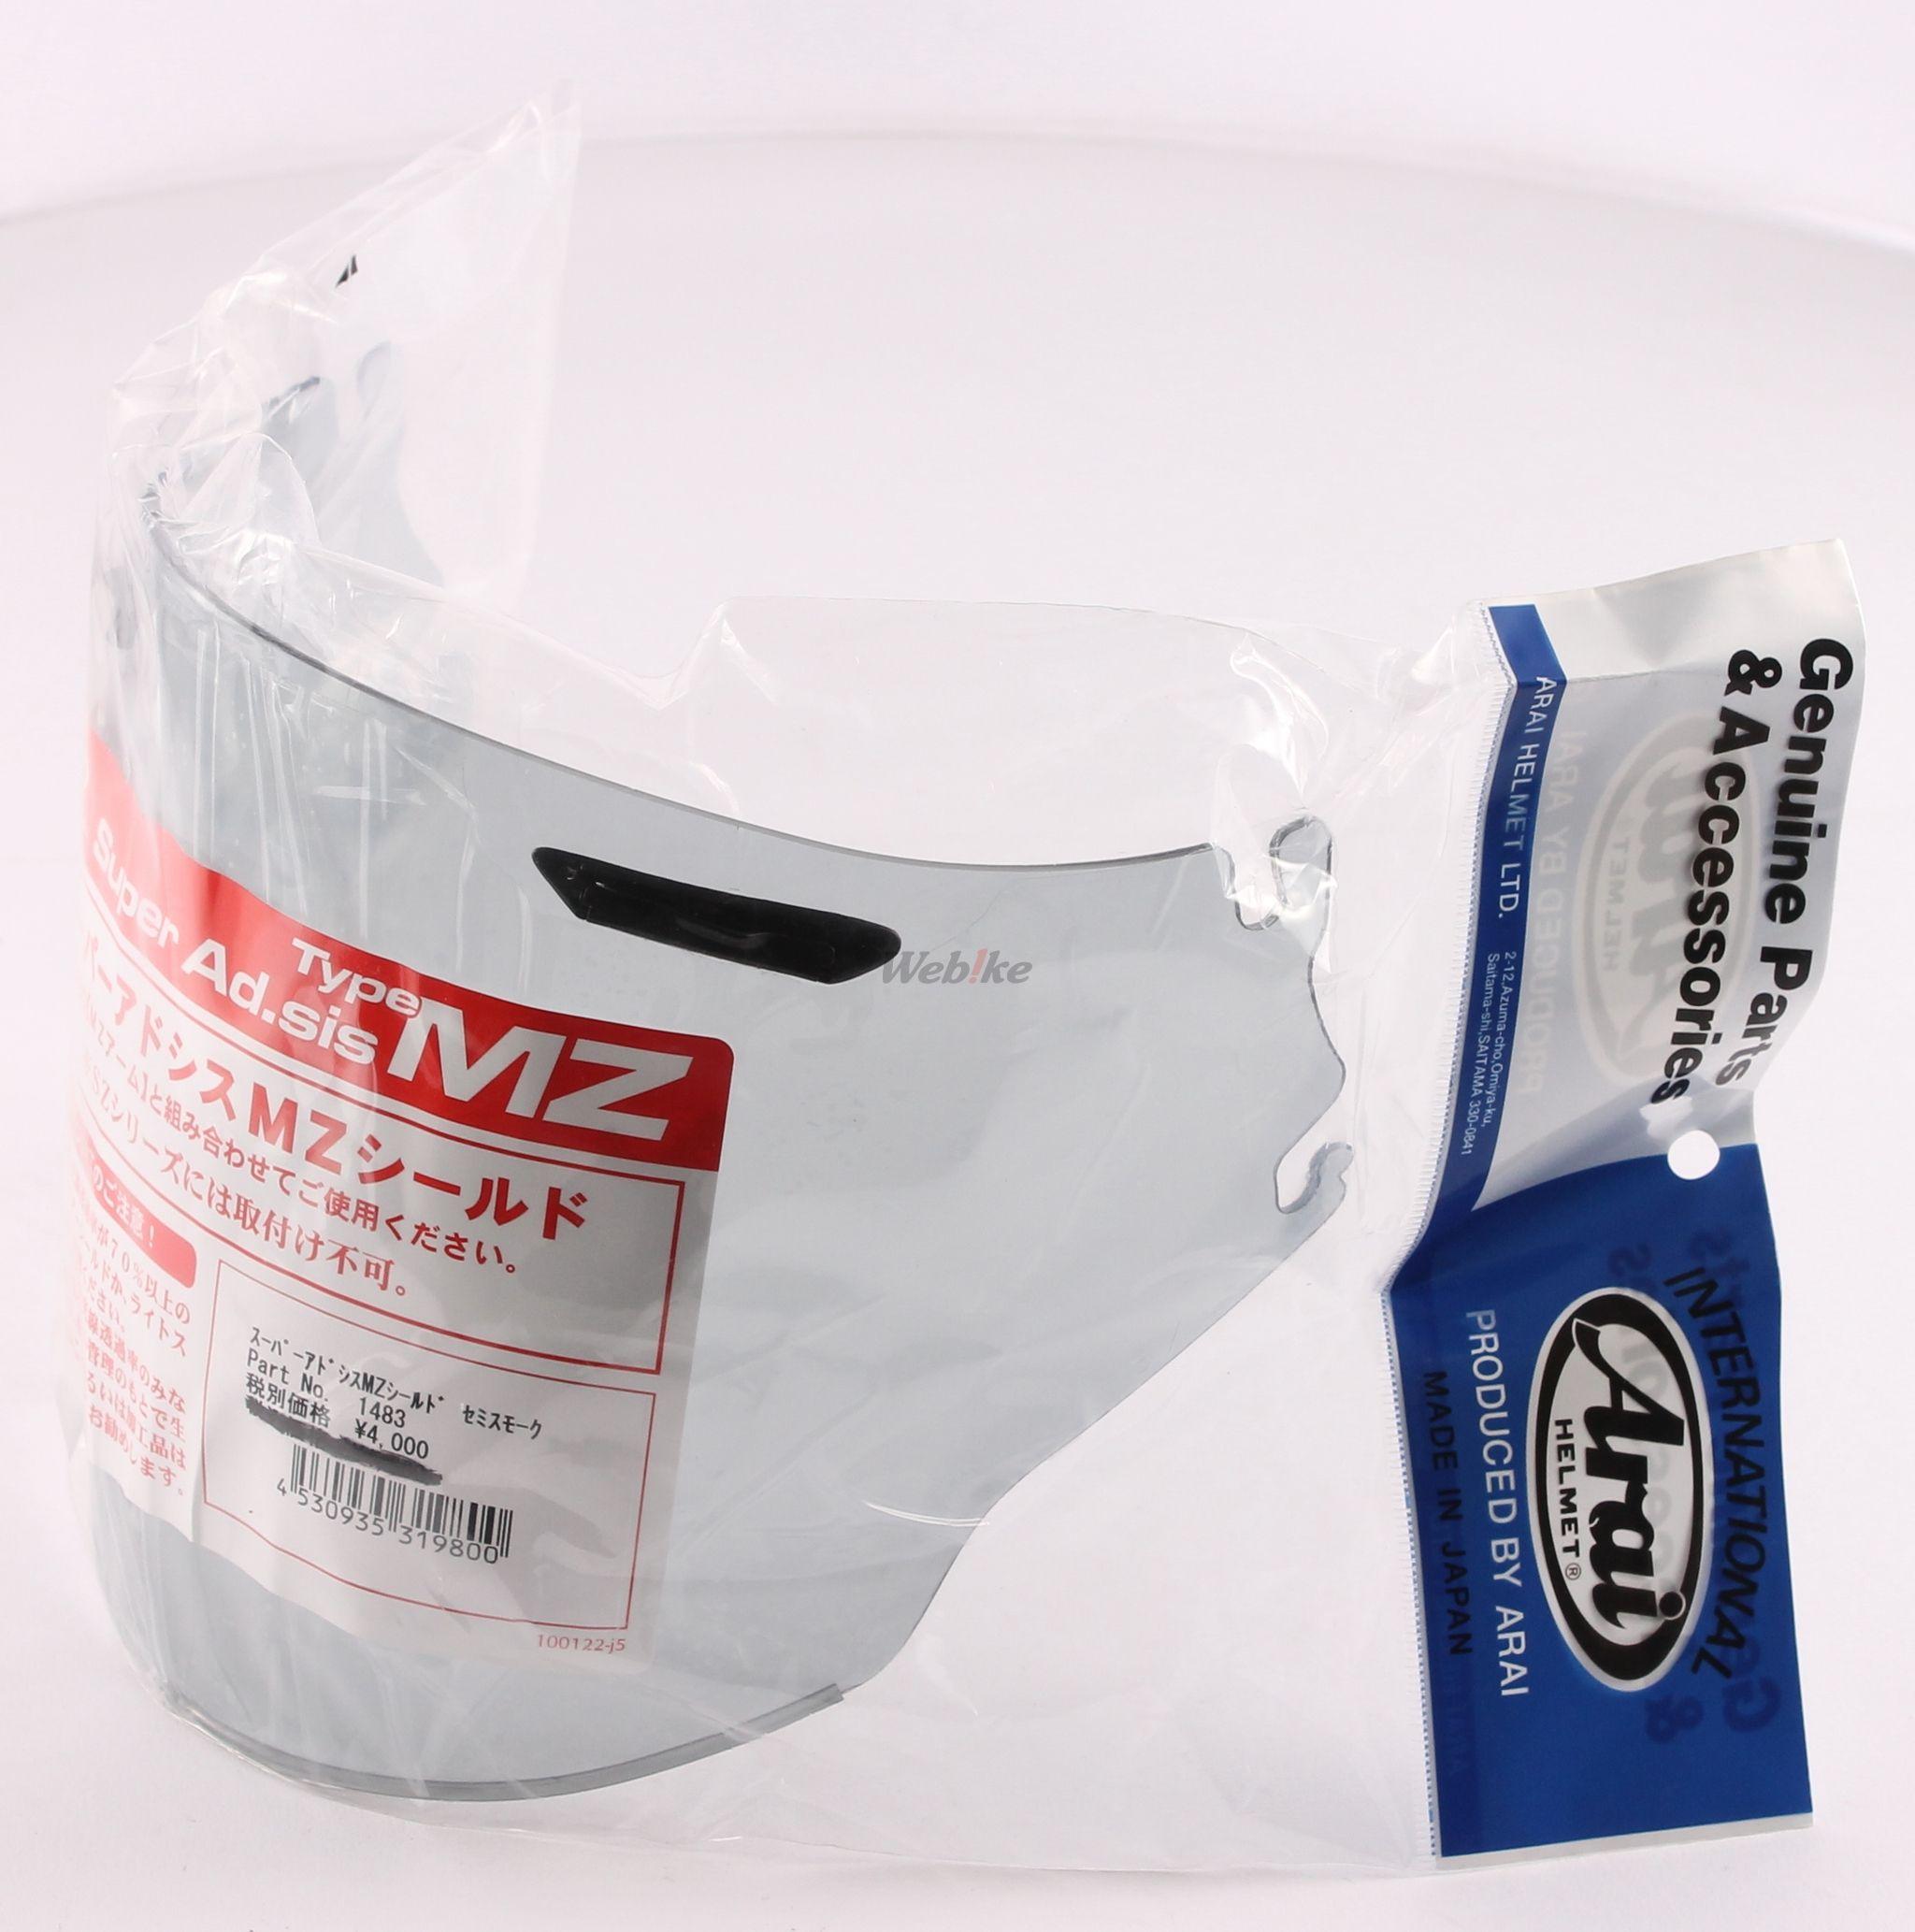 【Arai】Super adsis MZ安全帽鏡片 - 「Webike-摩托百貨」